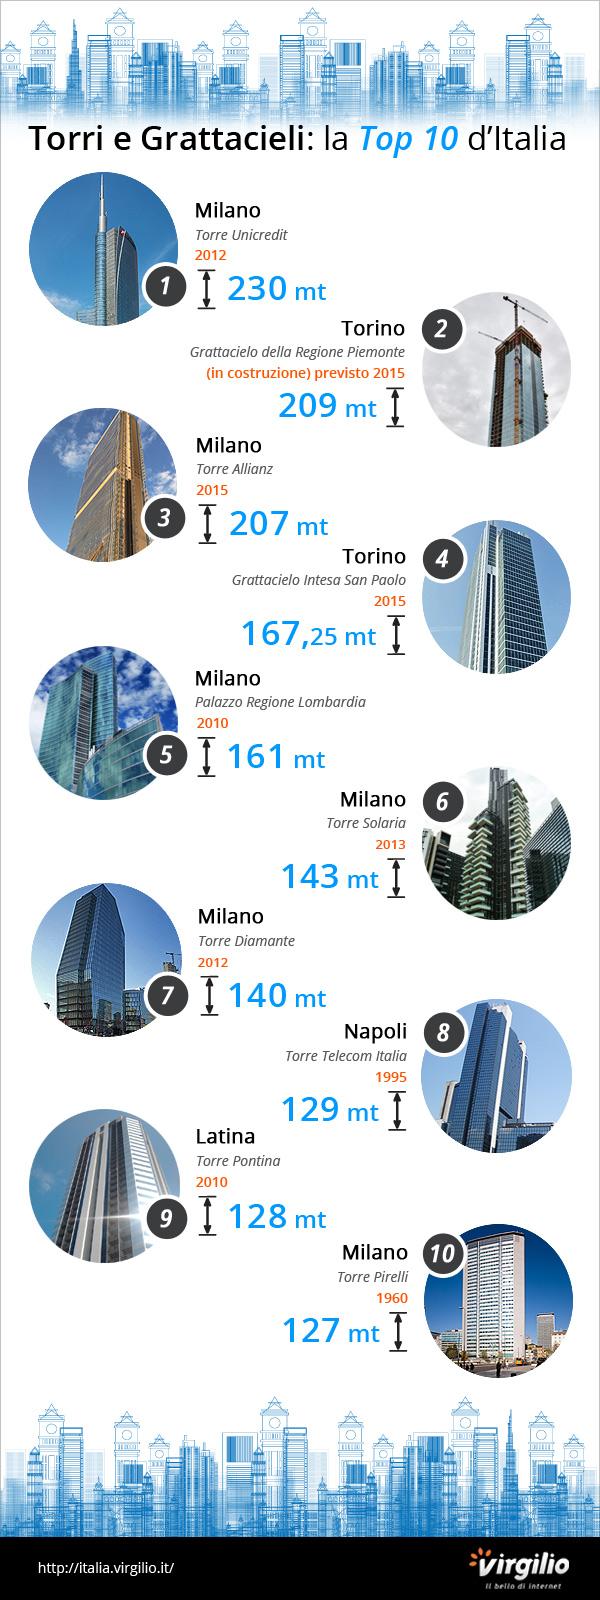 torri grattacieli alti